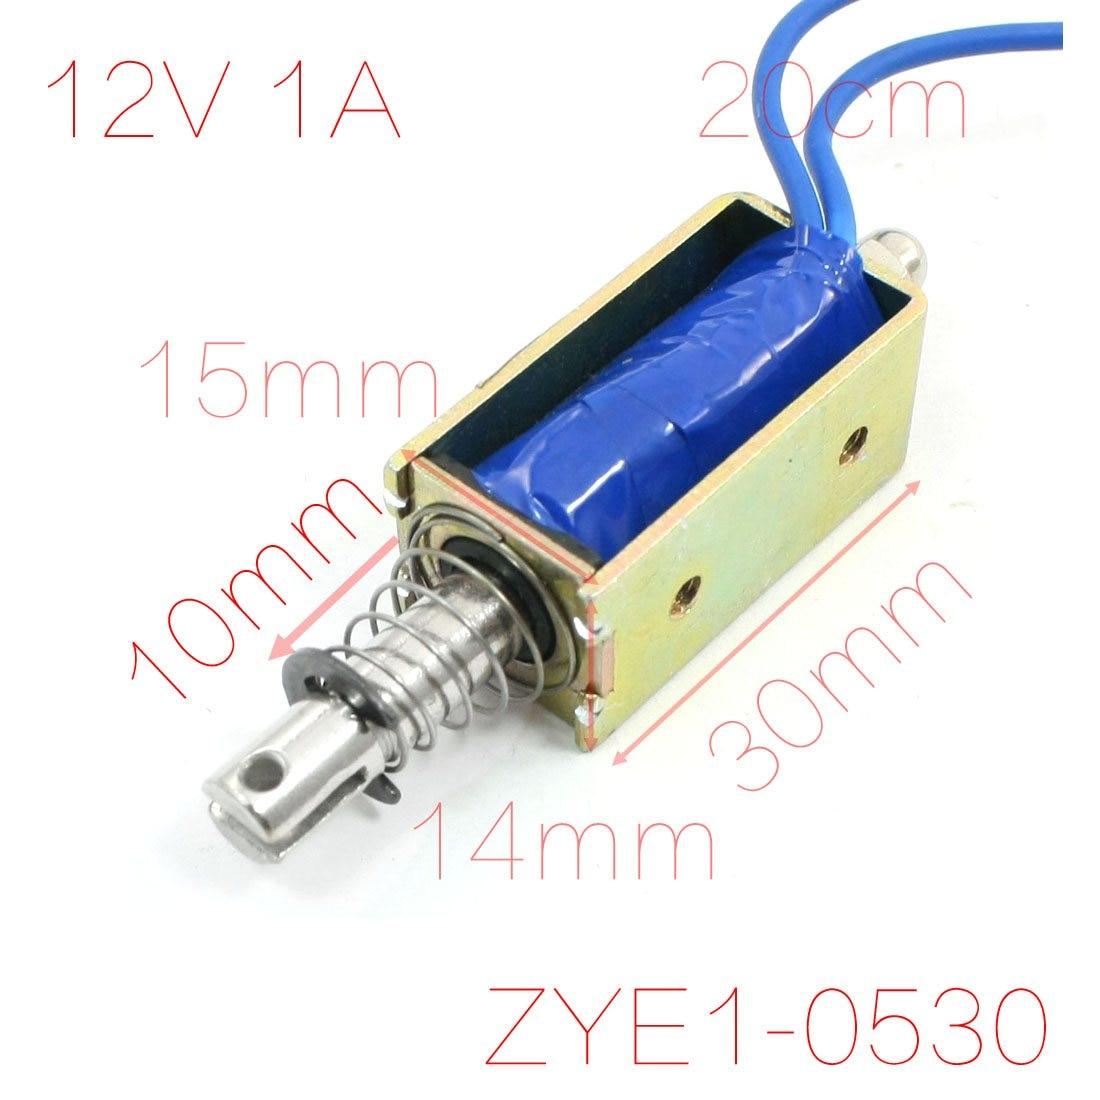 UXCELL 12V 1A 10Mm Stroke 600G Push Pull Type Open Frame Solenoid Electromagnet for Bank ...